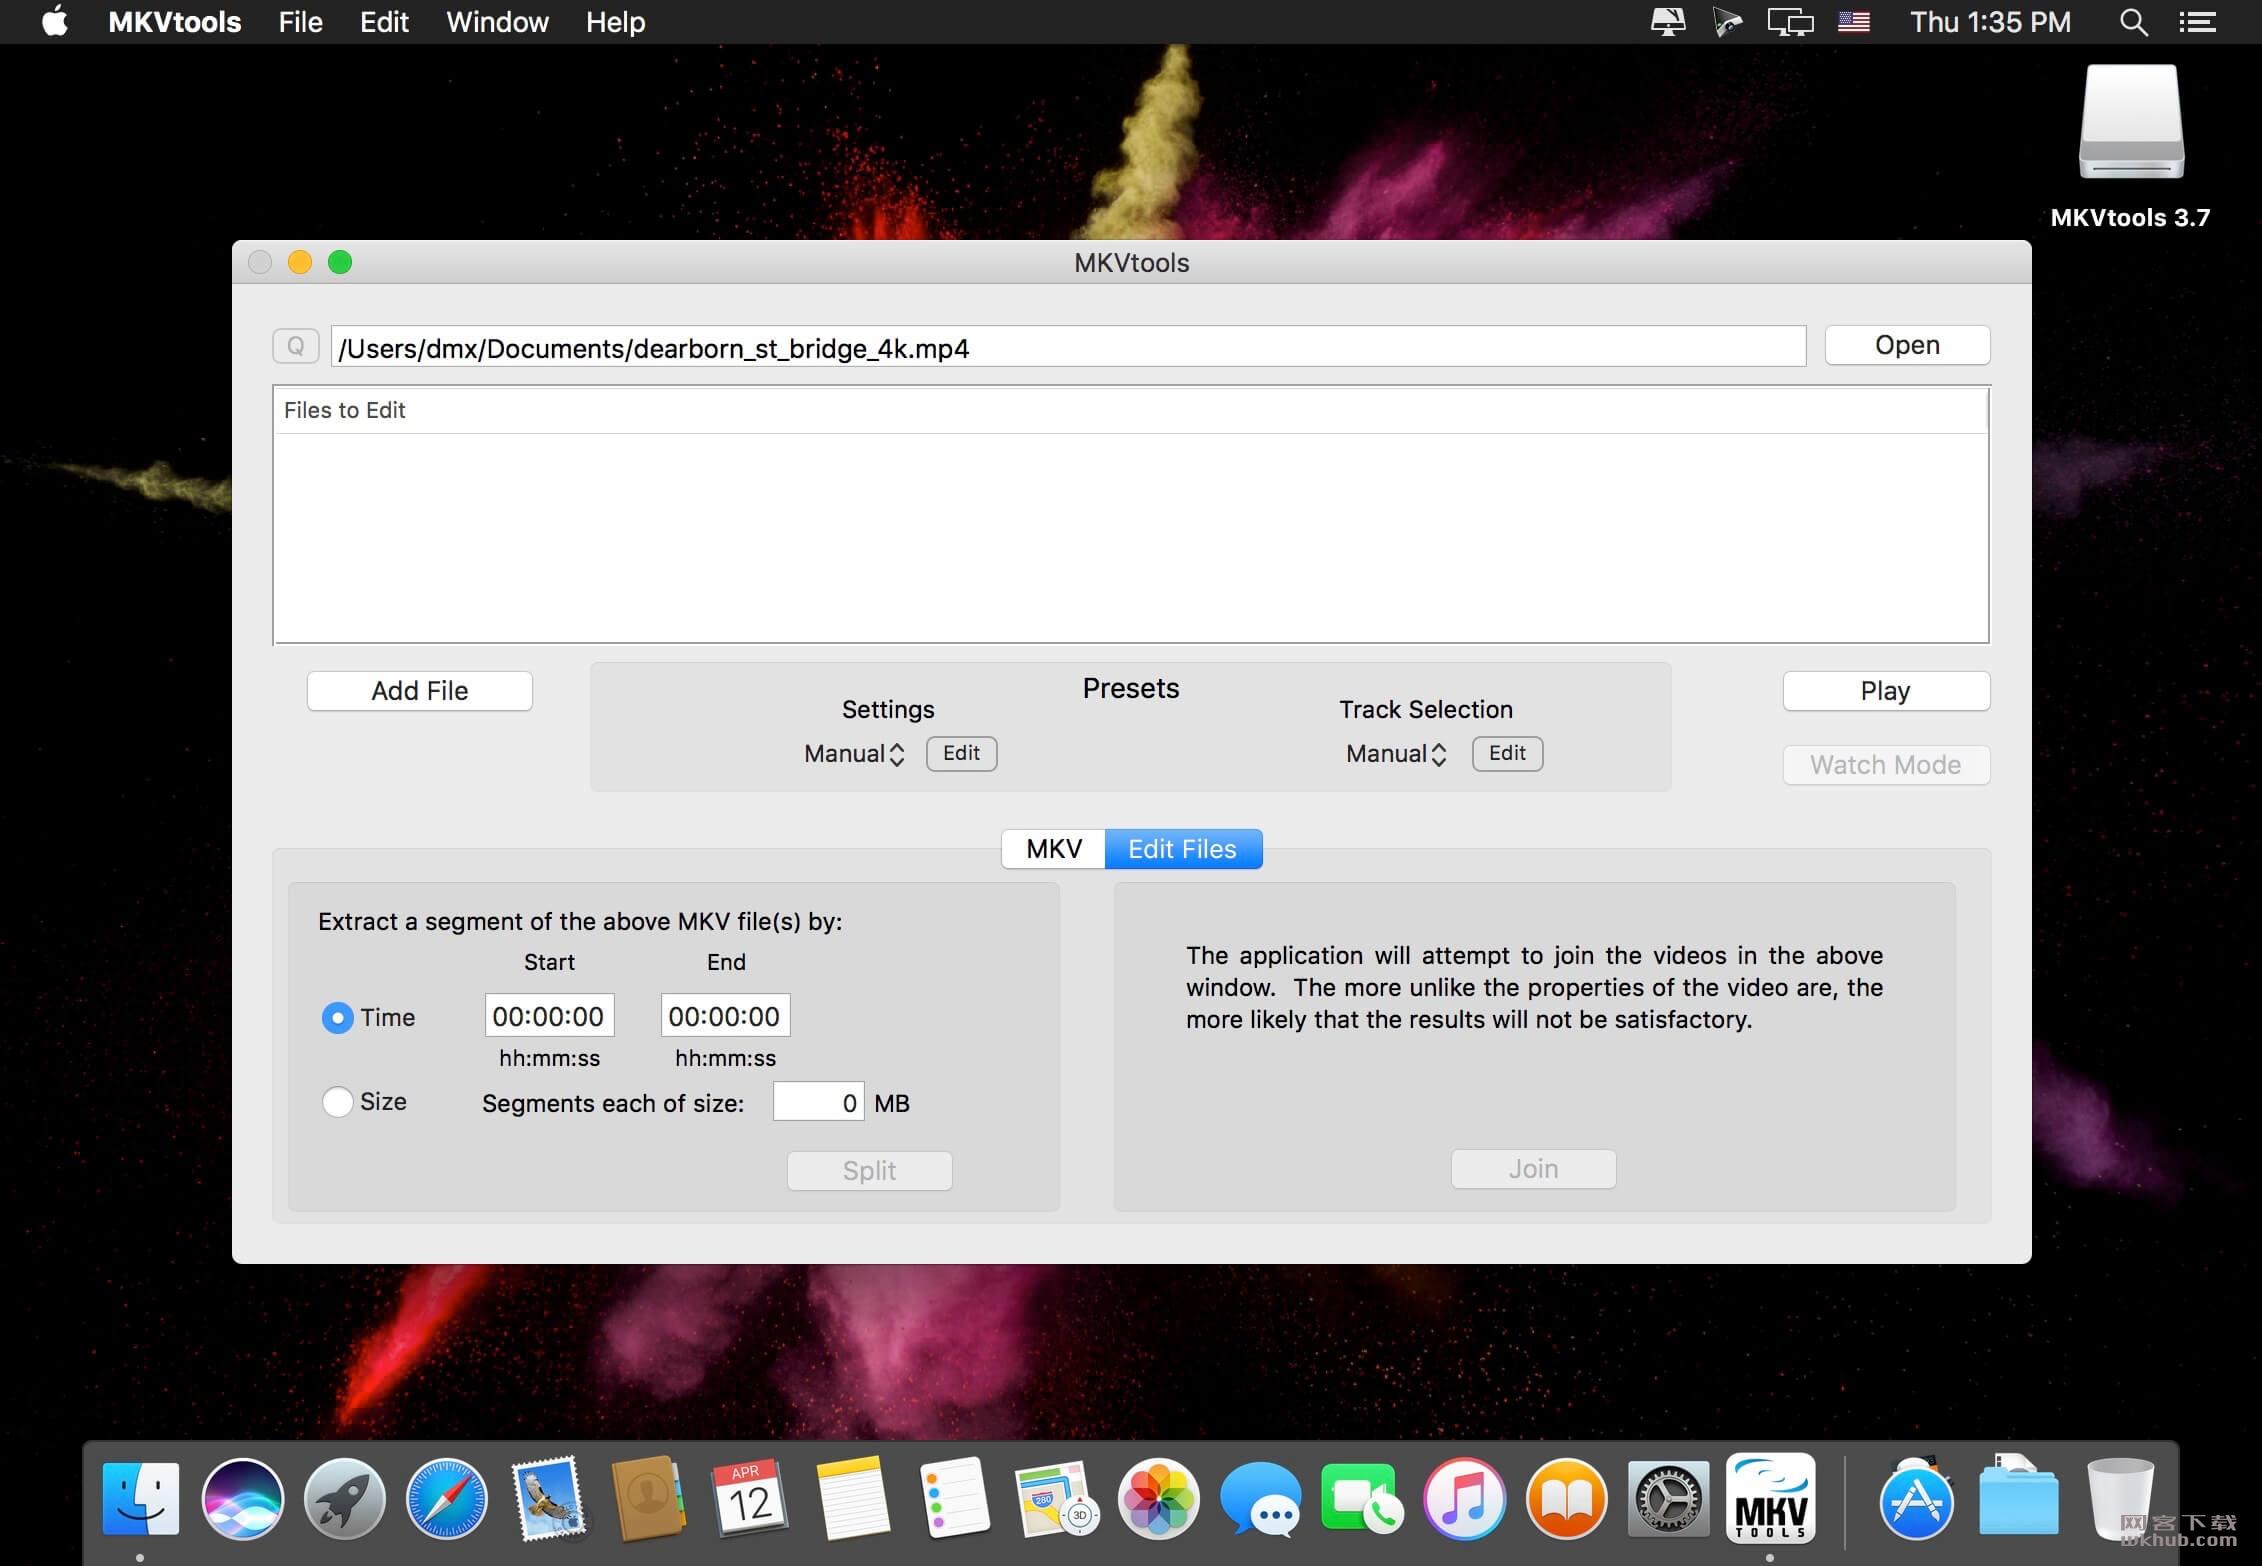 MKVtools 3.7.1 视频格式转换工具